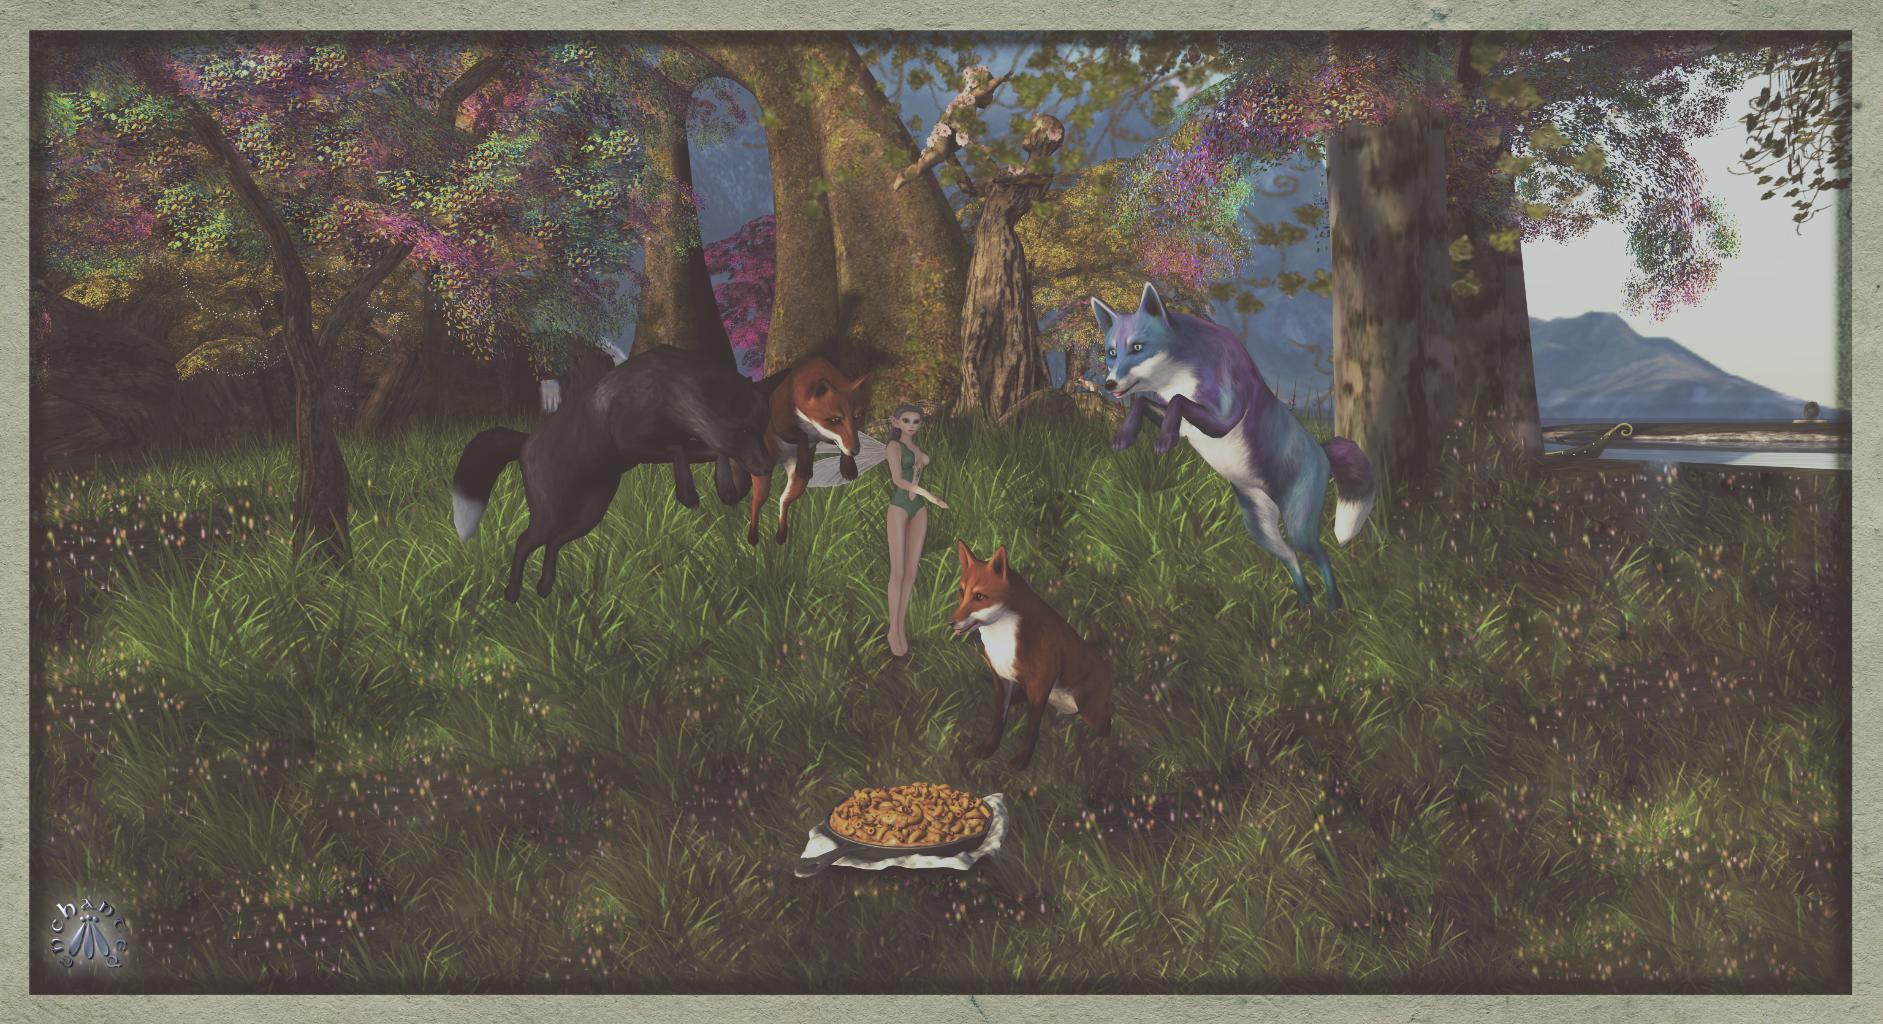 enchantment kitsune 3 edit - 11 BLOG